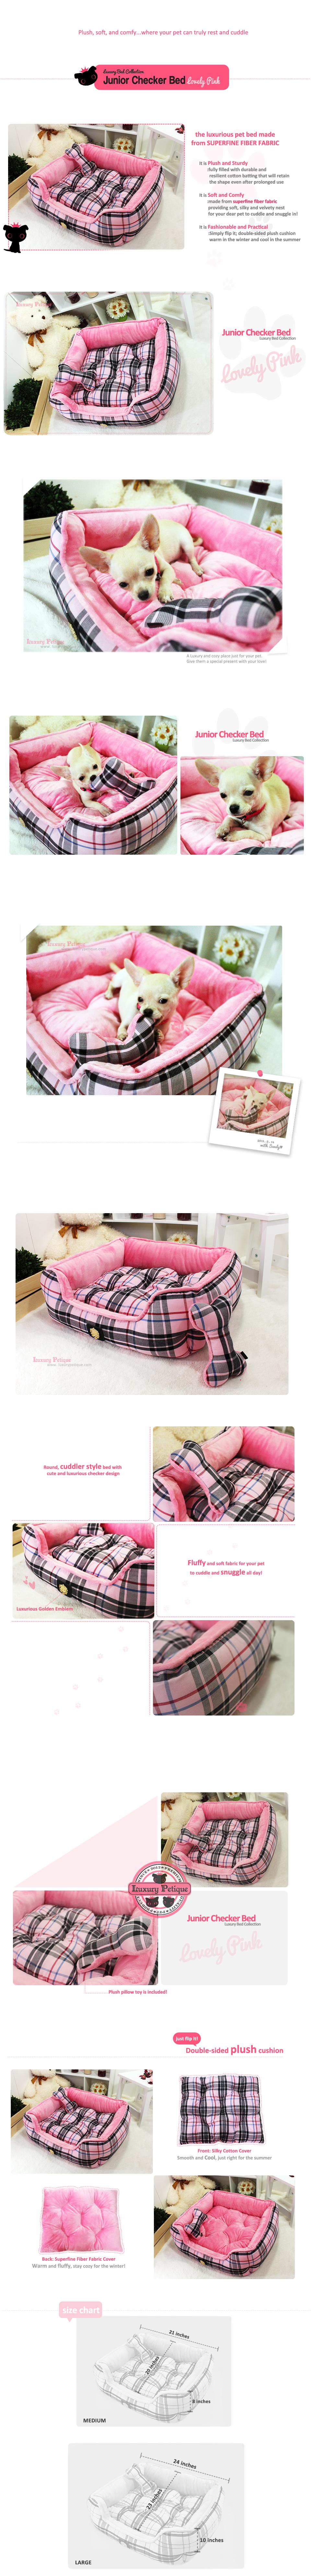 junior-pink-bed.png